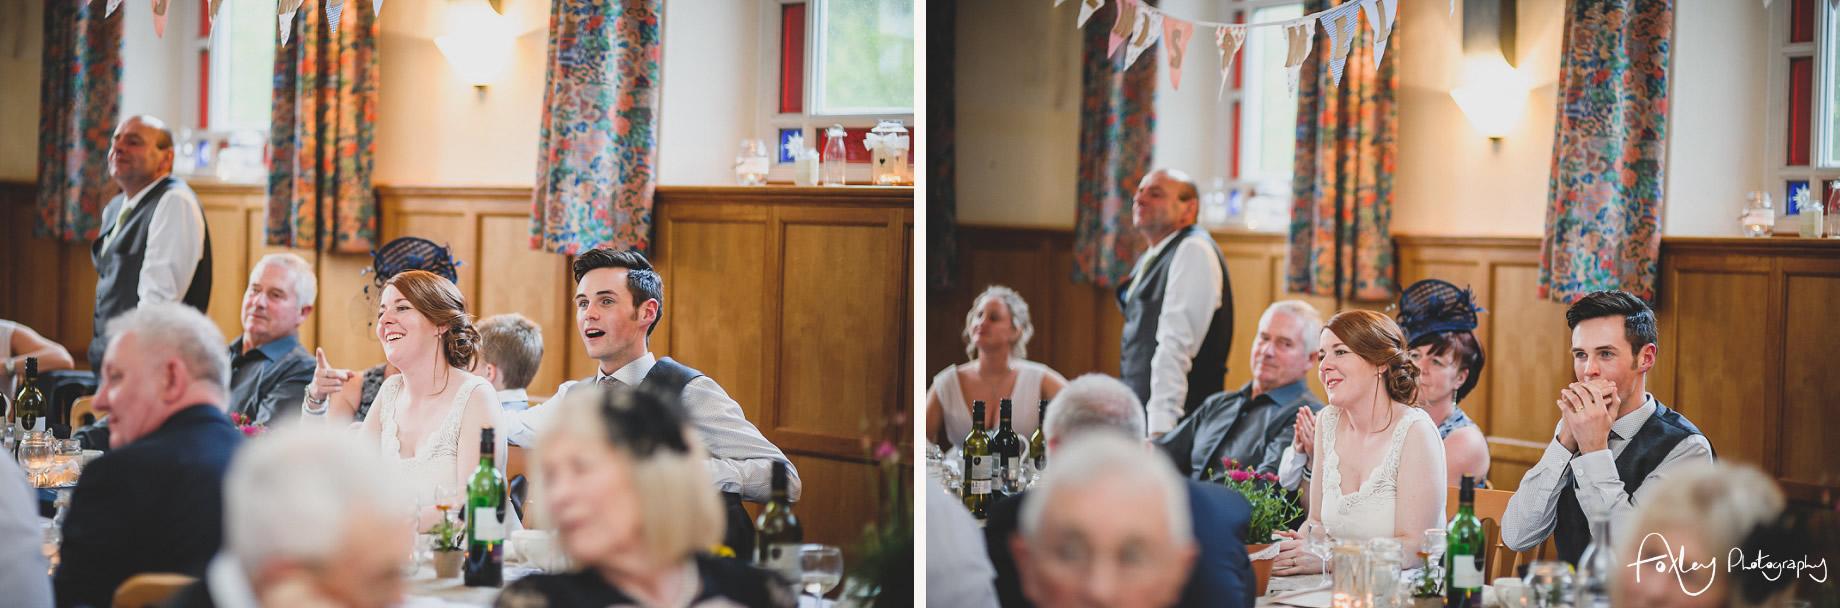 Mel-and-Lewis-Wedding-at-Barley-Village-Hall-162